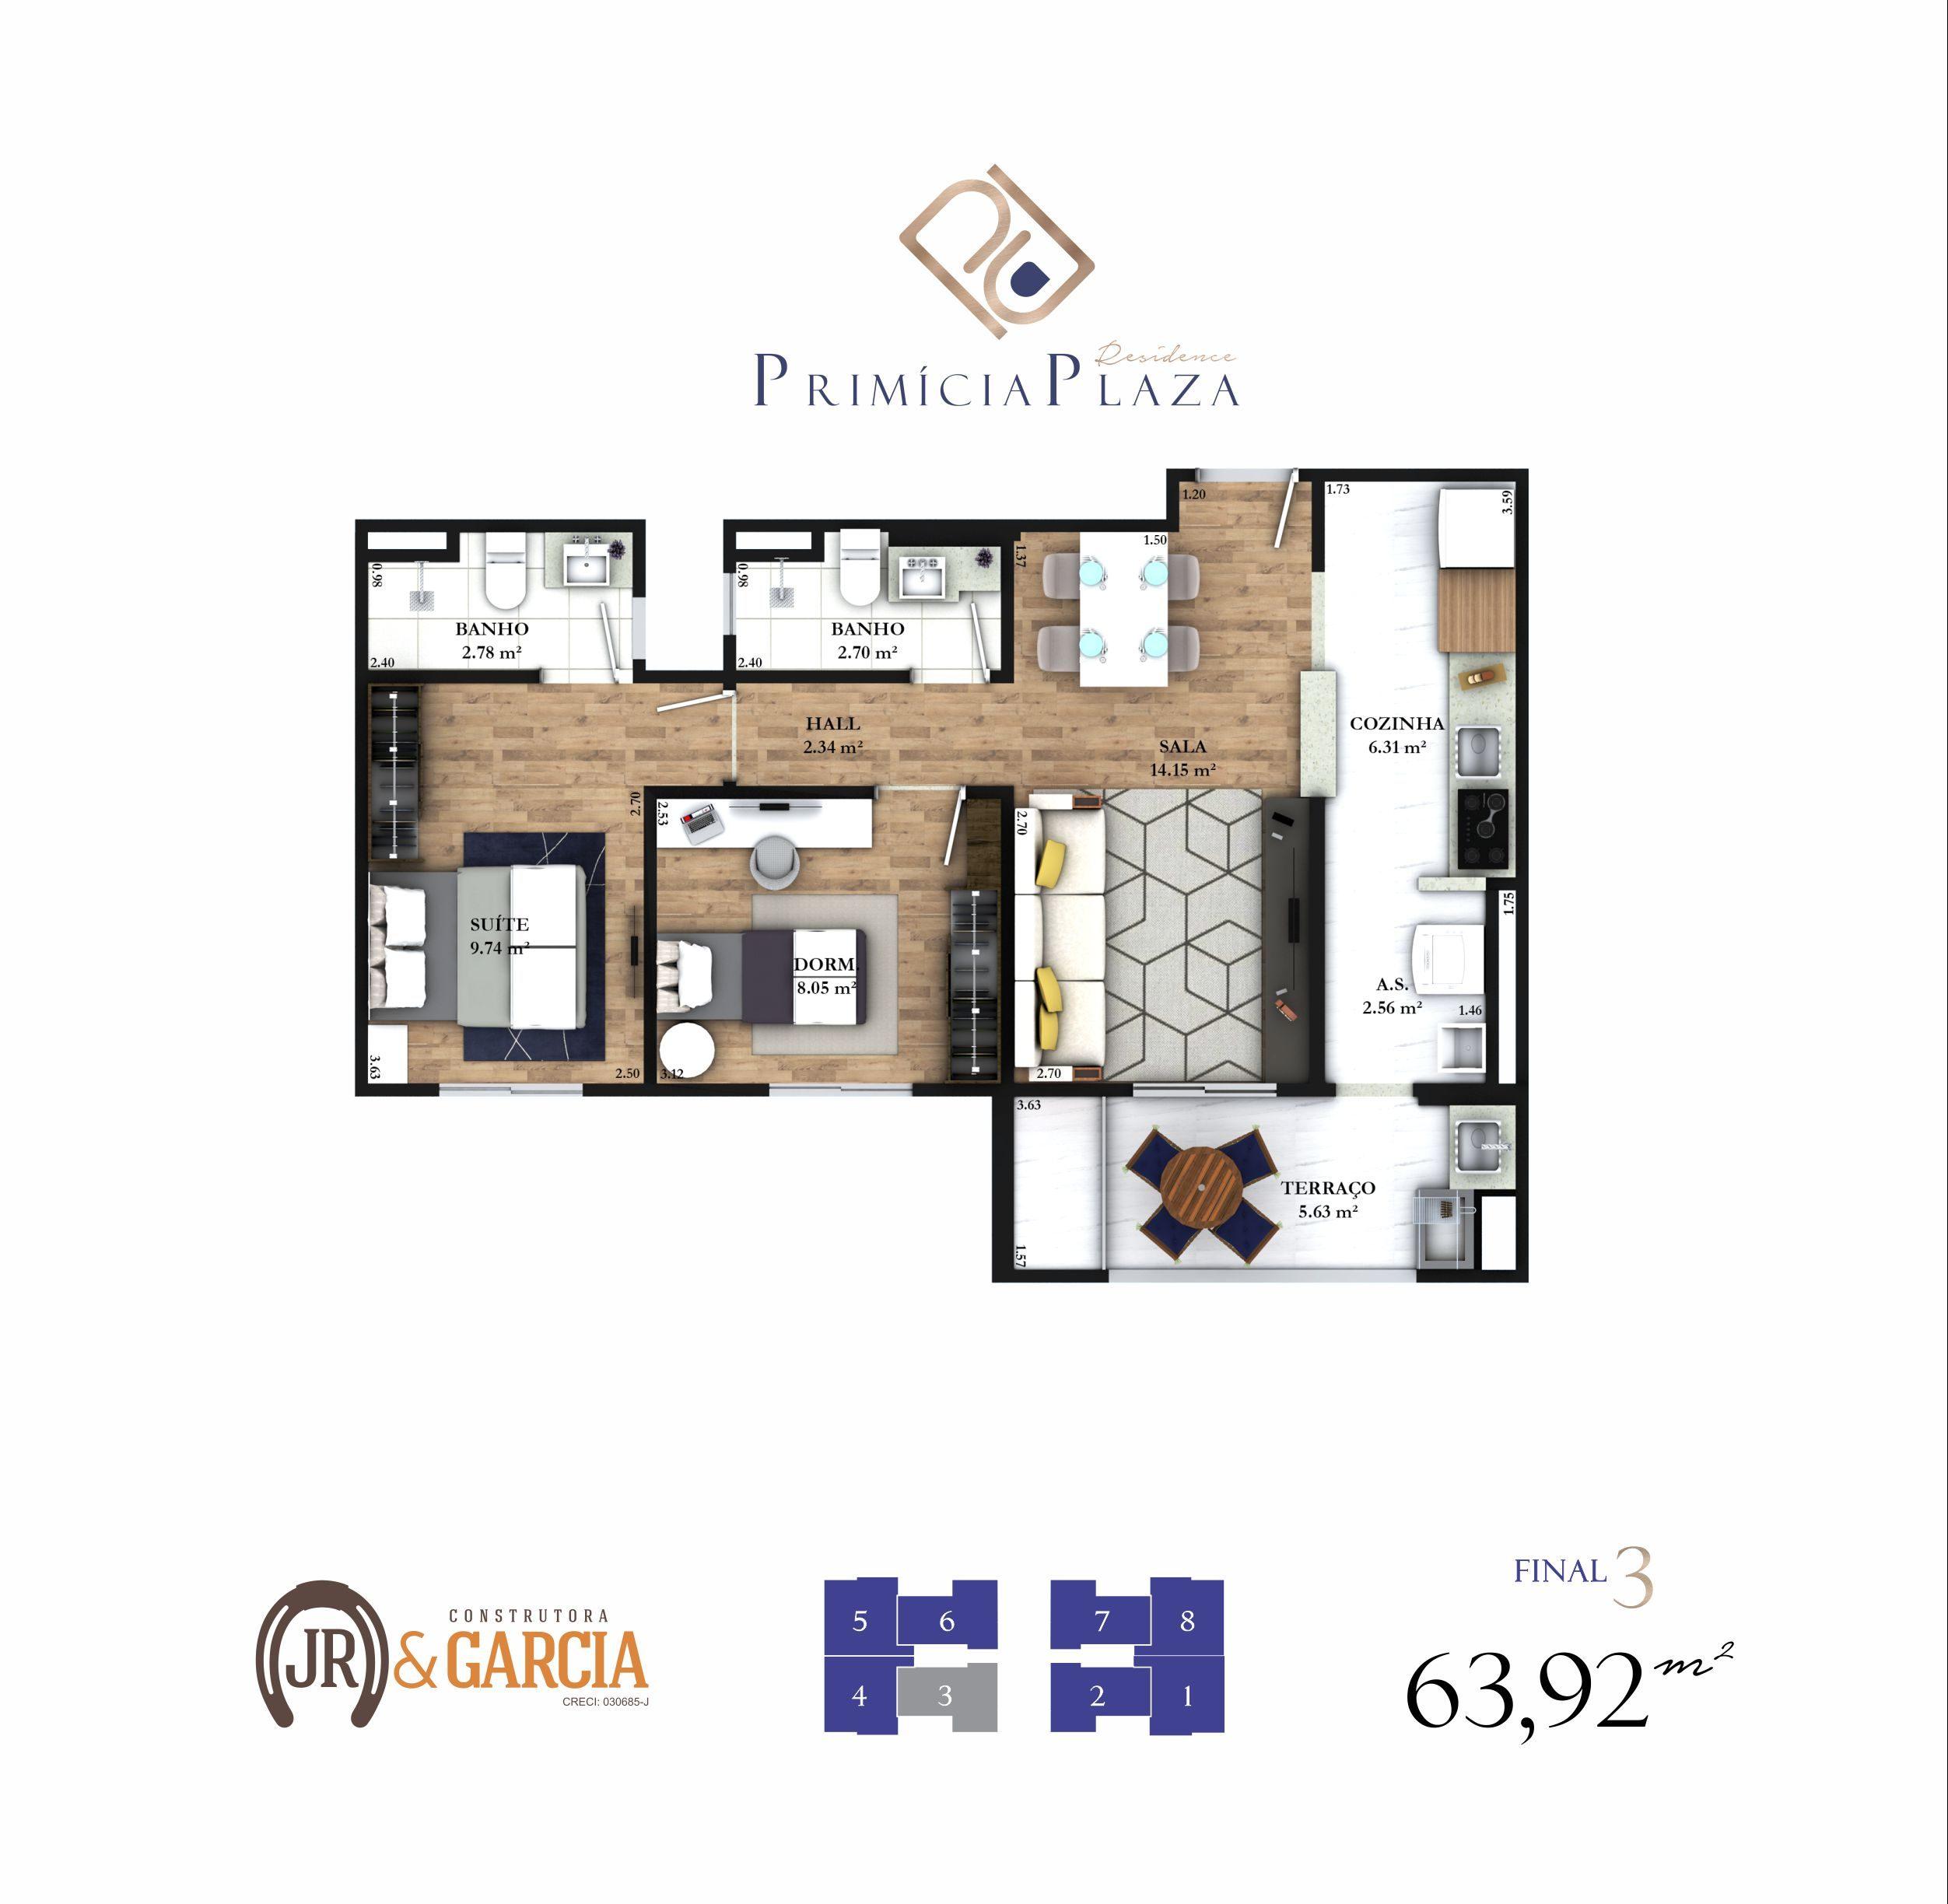 Apartamento 13-193 - 63,00 m² - Residencial Primícia Plaza - Praia Grande SP